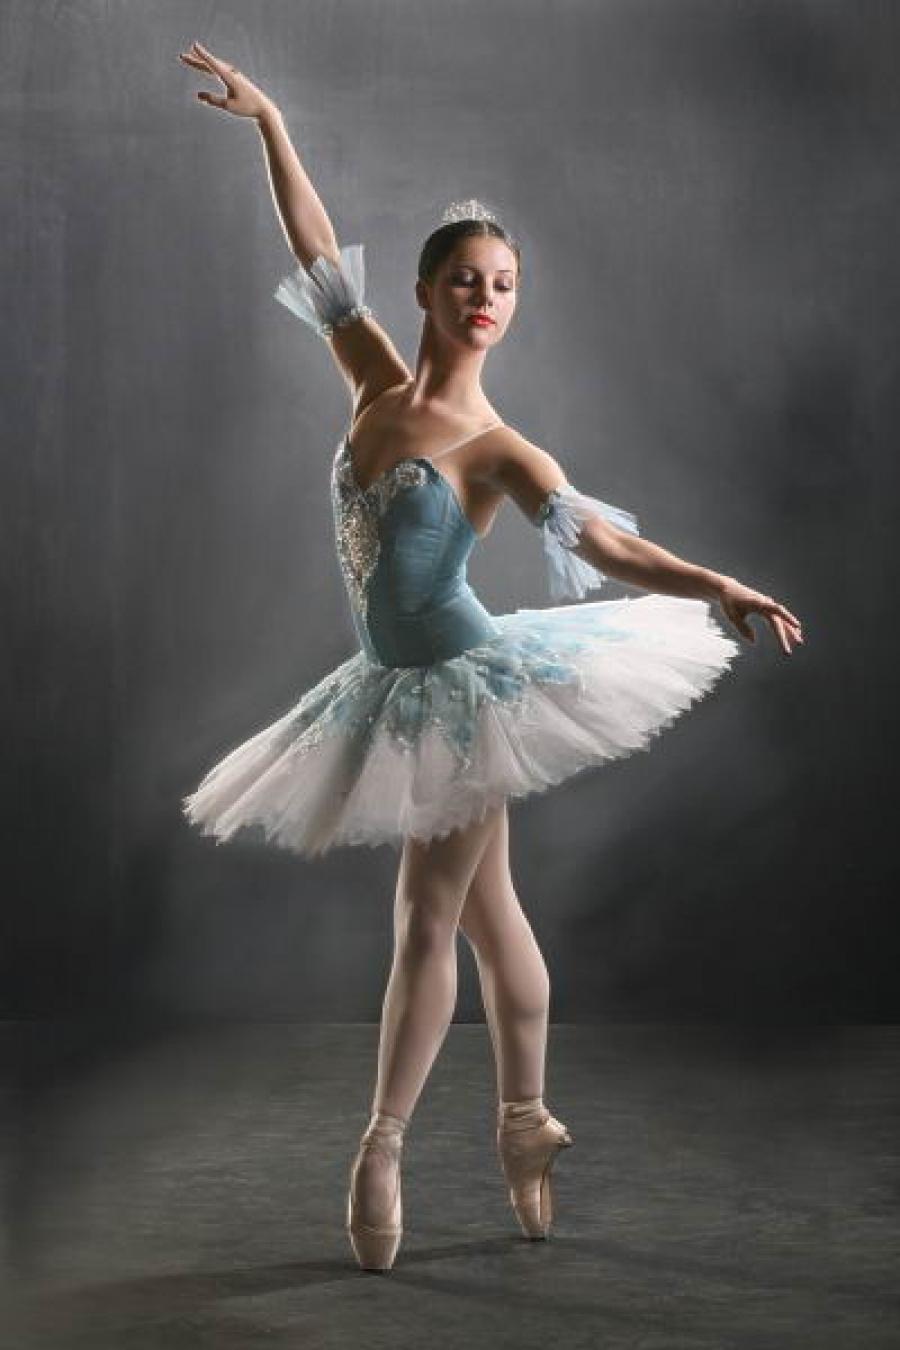 Фото позиций балерин 16 фотография